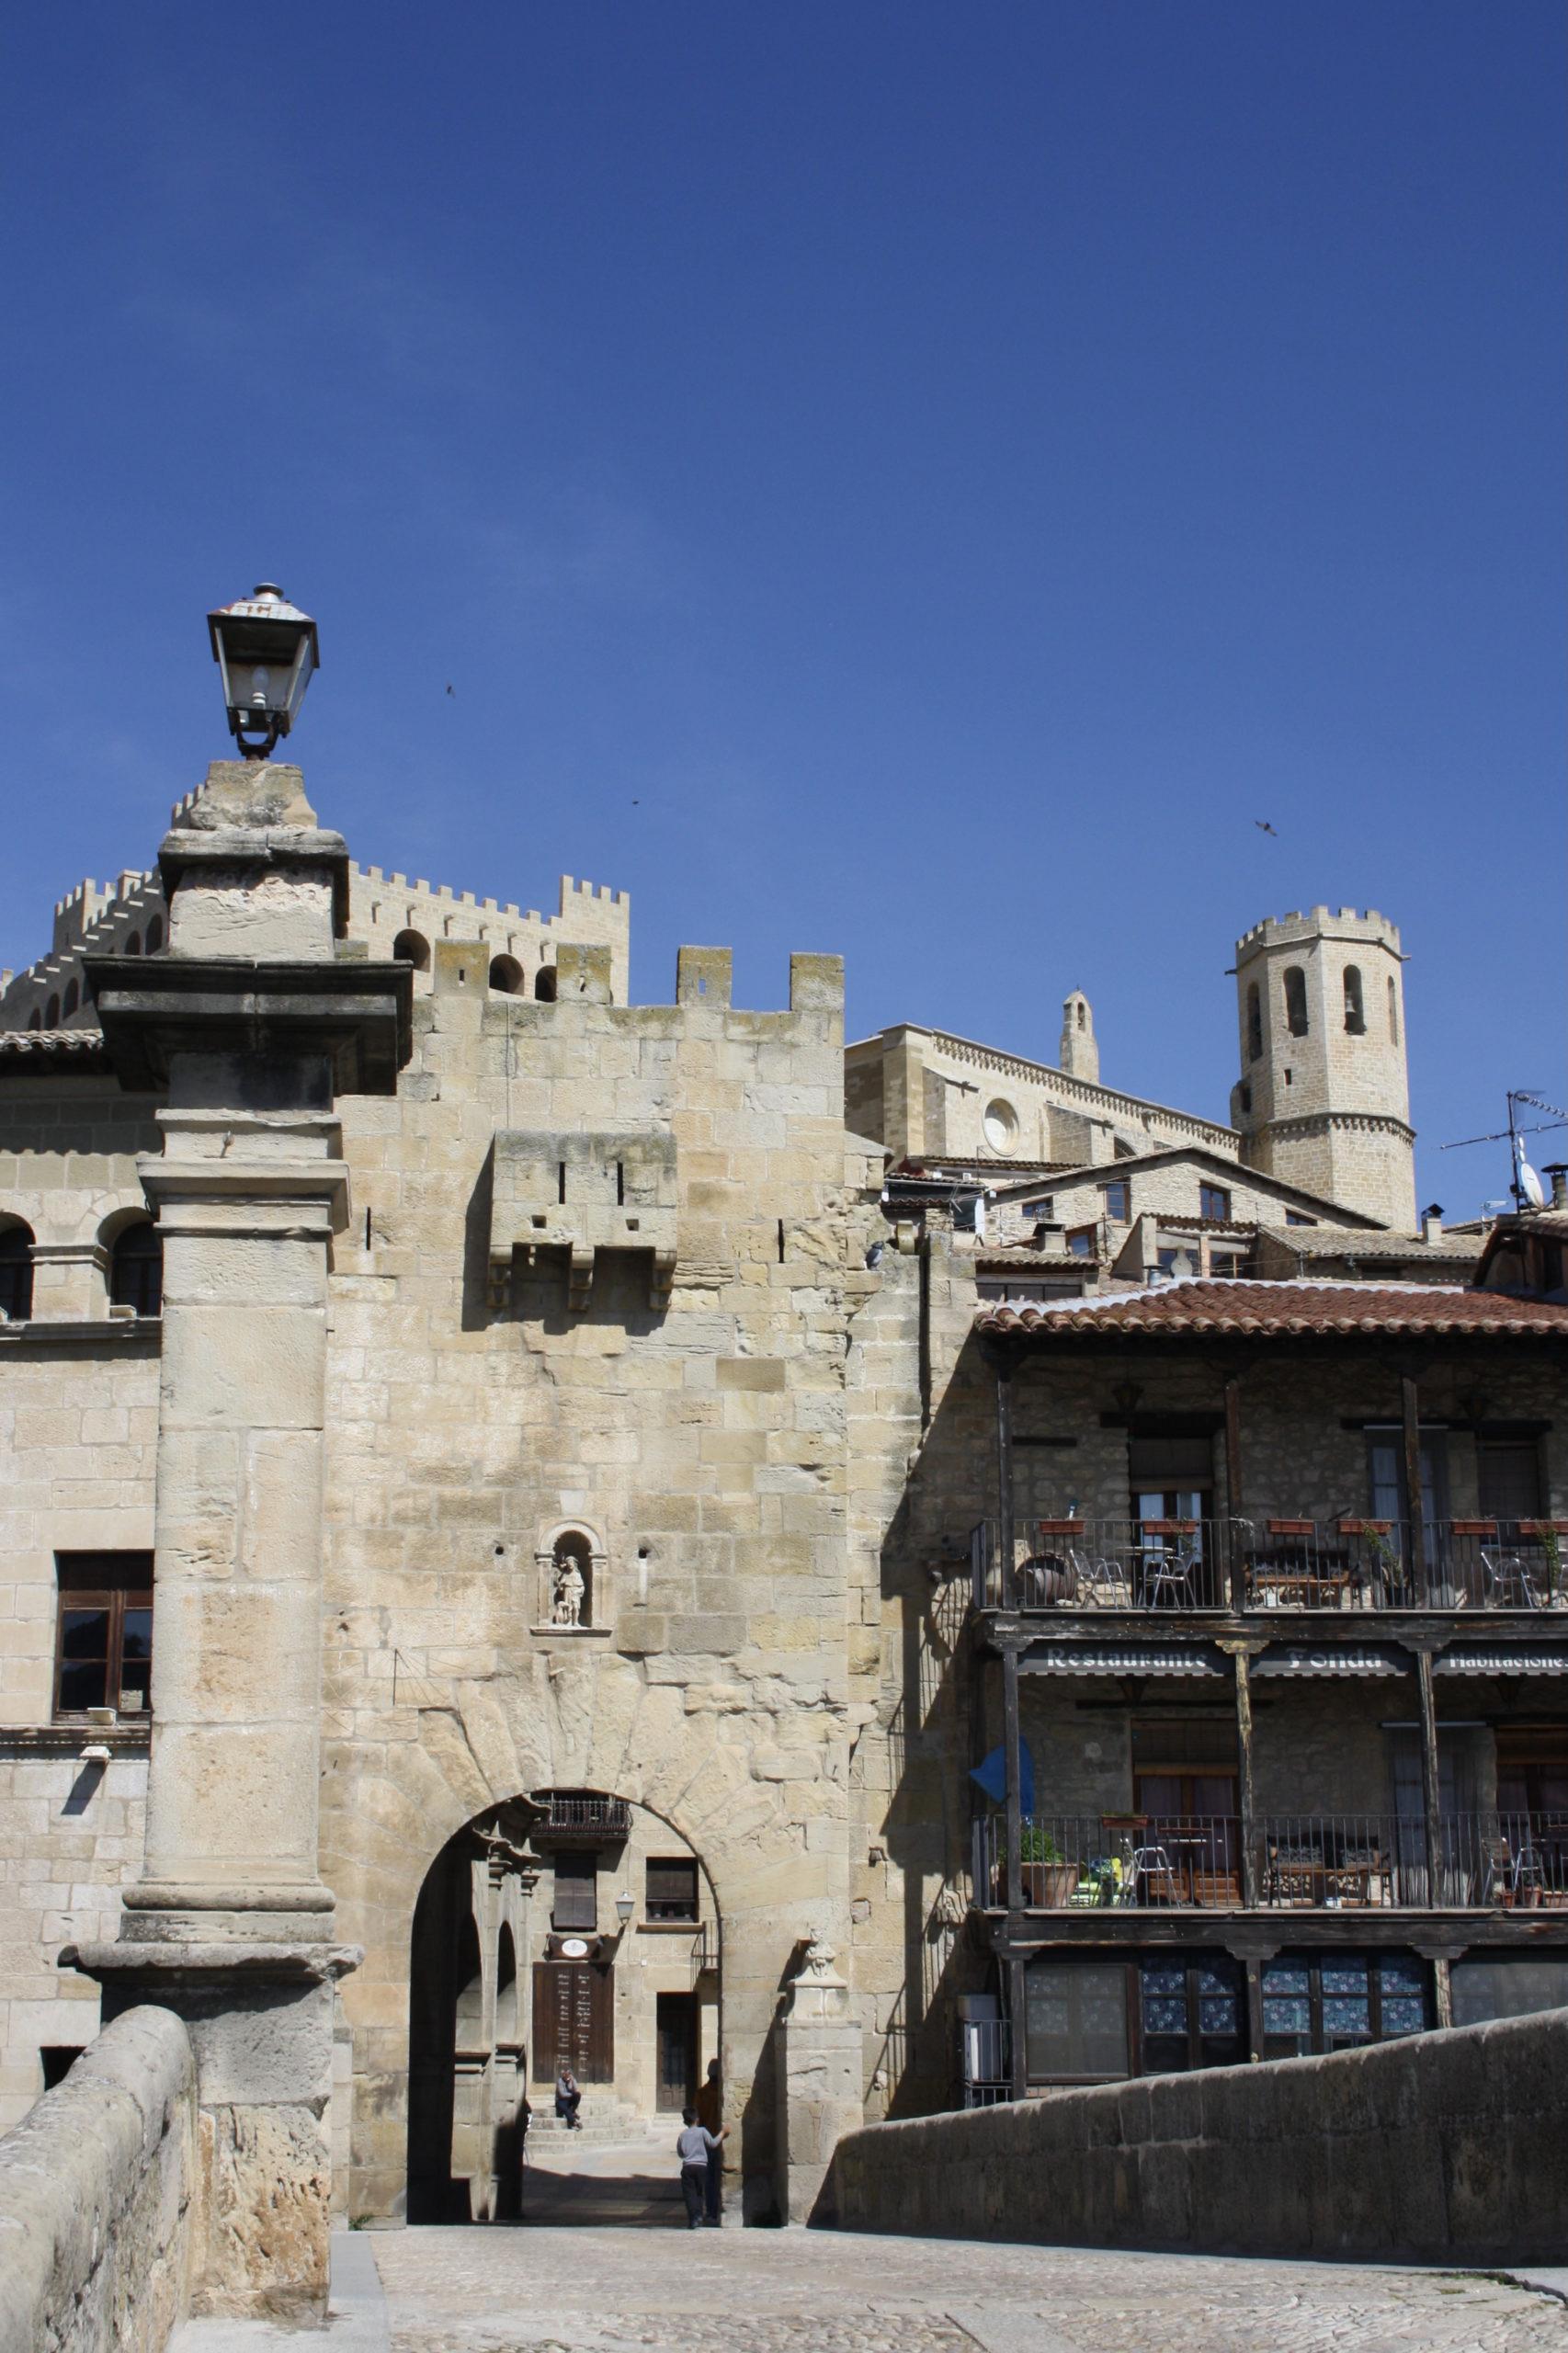 castillos de aragón Castillo de Valderobles. Foto: Alfredo Cortés